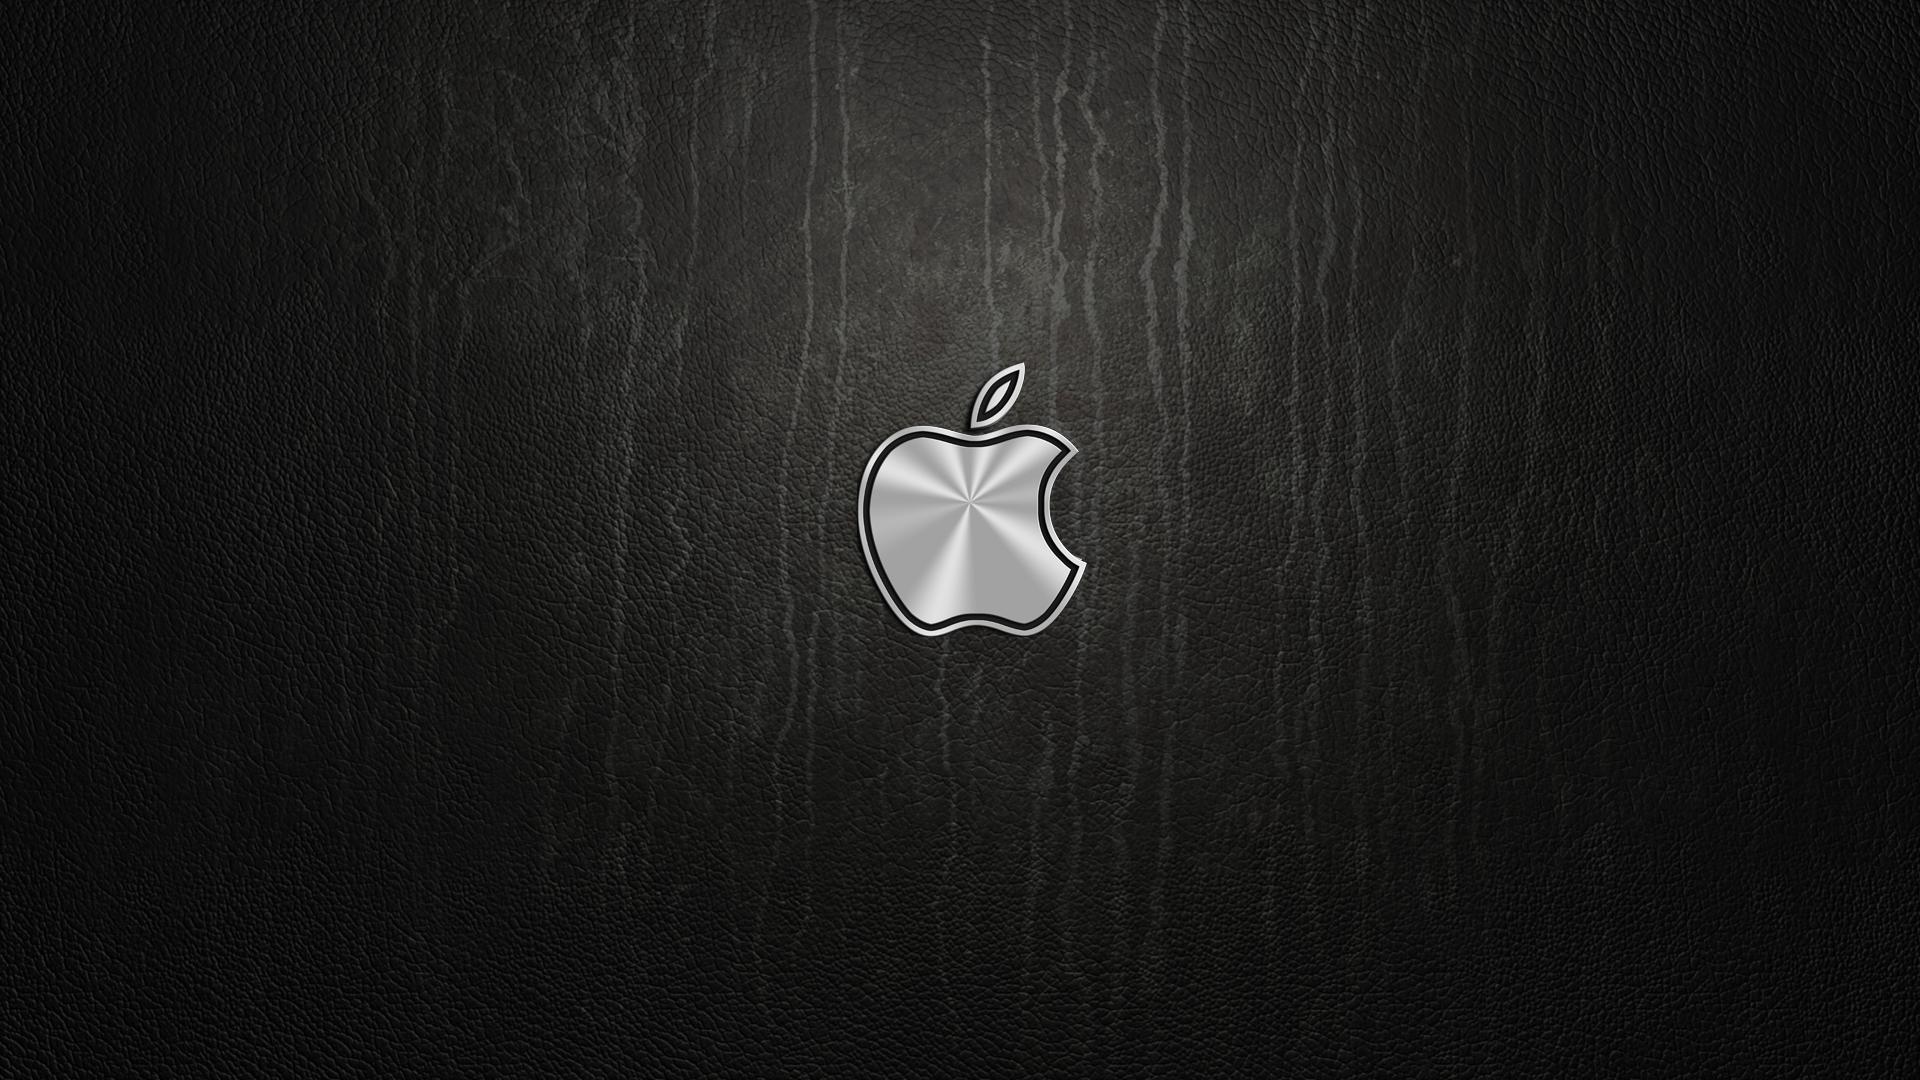 Apple full hd sfondo and sfondi 1920x1080 id 588066 for Sfondo apple hd